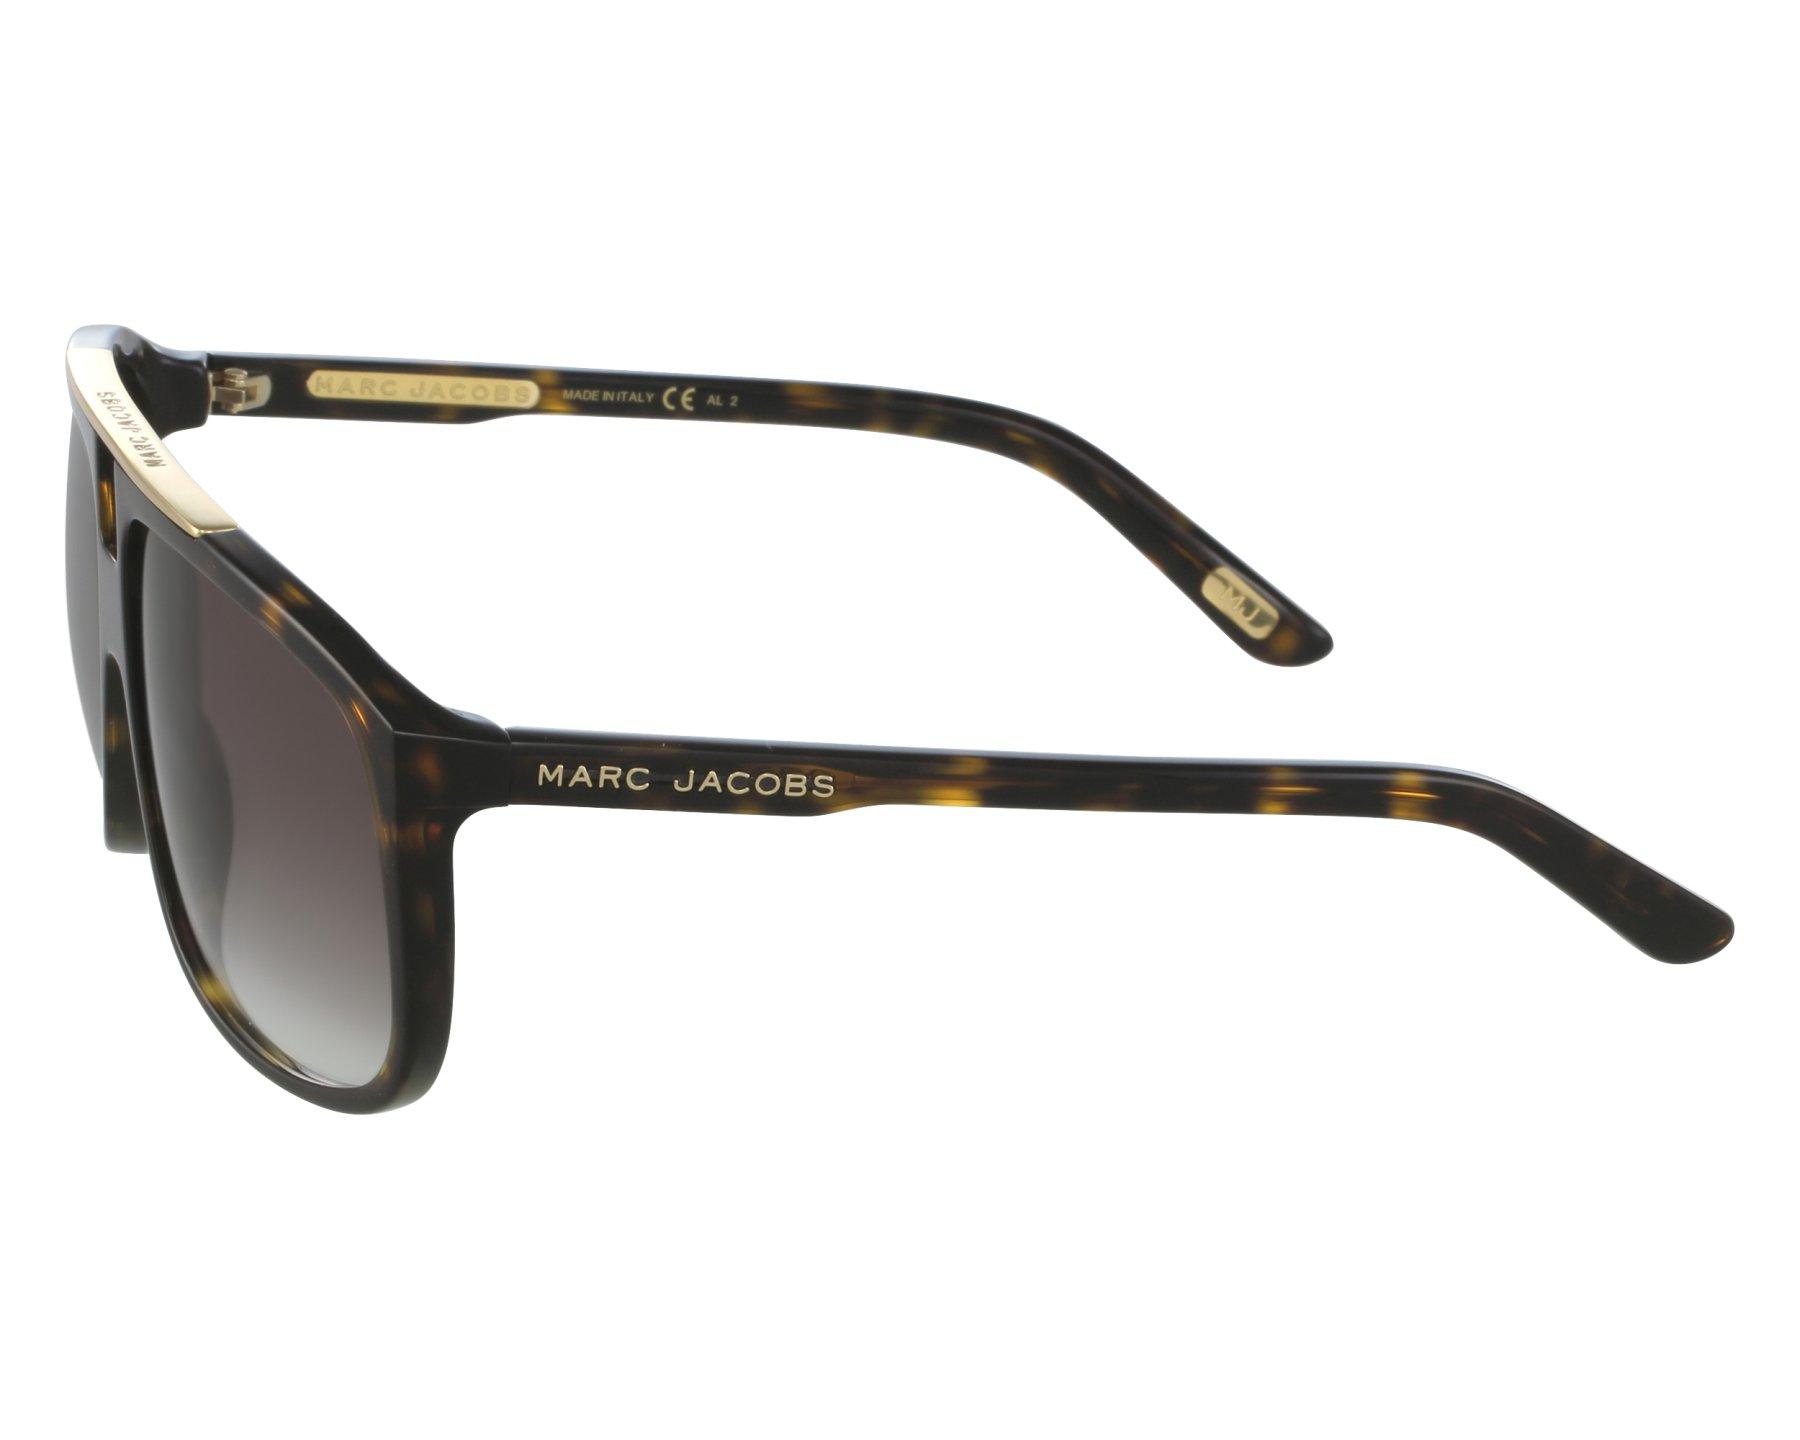 Gafas de sol Marc Jacobs MJ-252-S 086 JS 60-13 b322c0147f